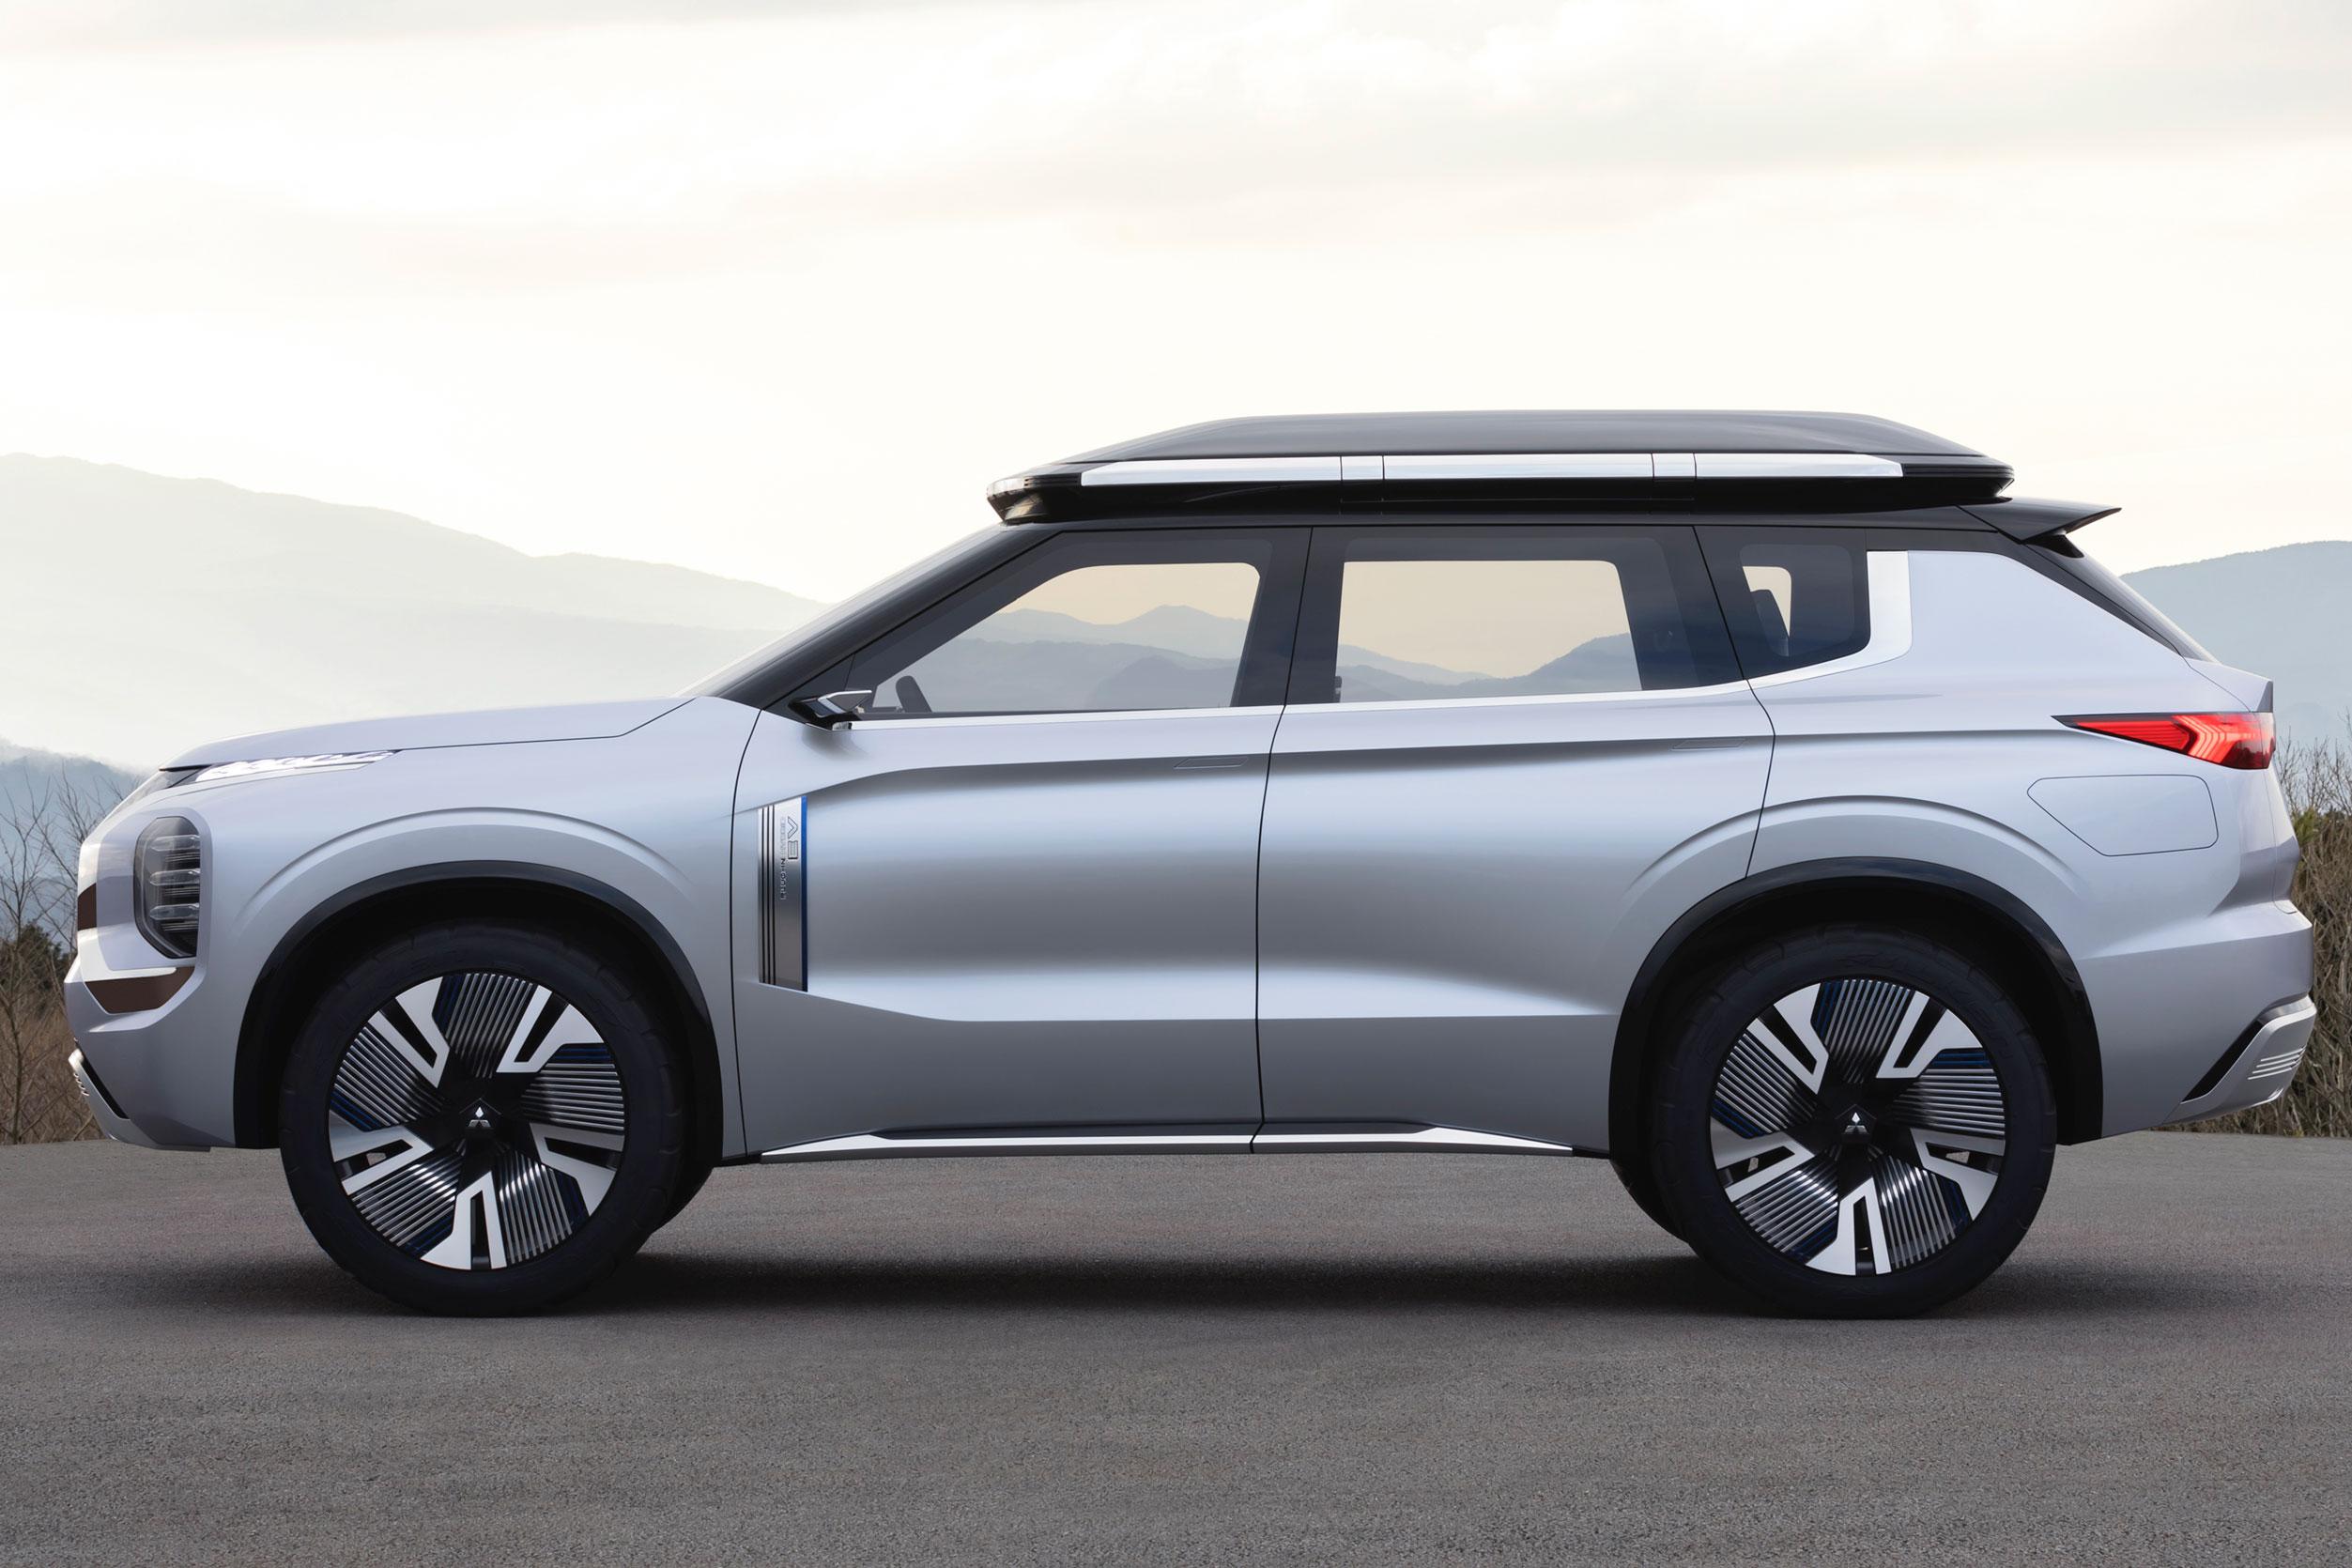 Mitsubishi Engleberg Tourer concept hybrid SUV